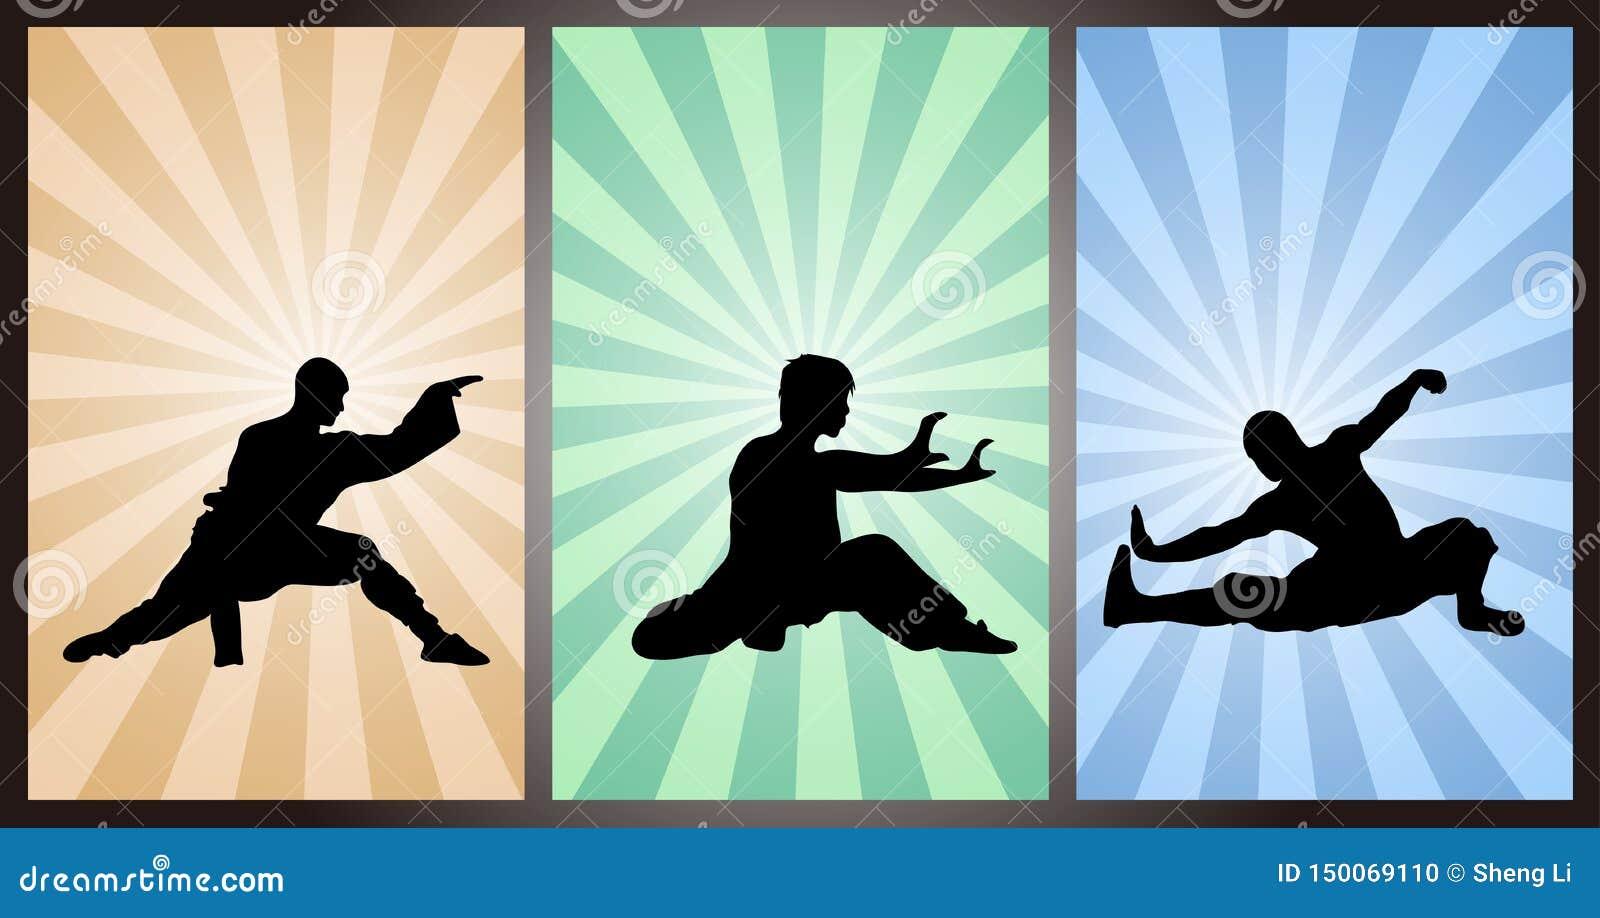 Китаец <b>Kung Fu</b>, <b>Wushu</b>, боевые искусства, китайский бокс ...